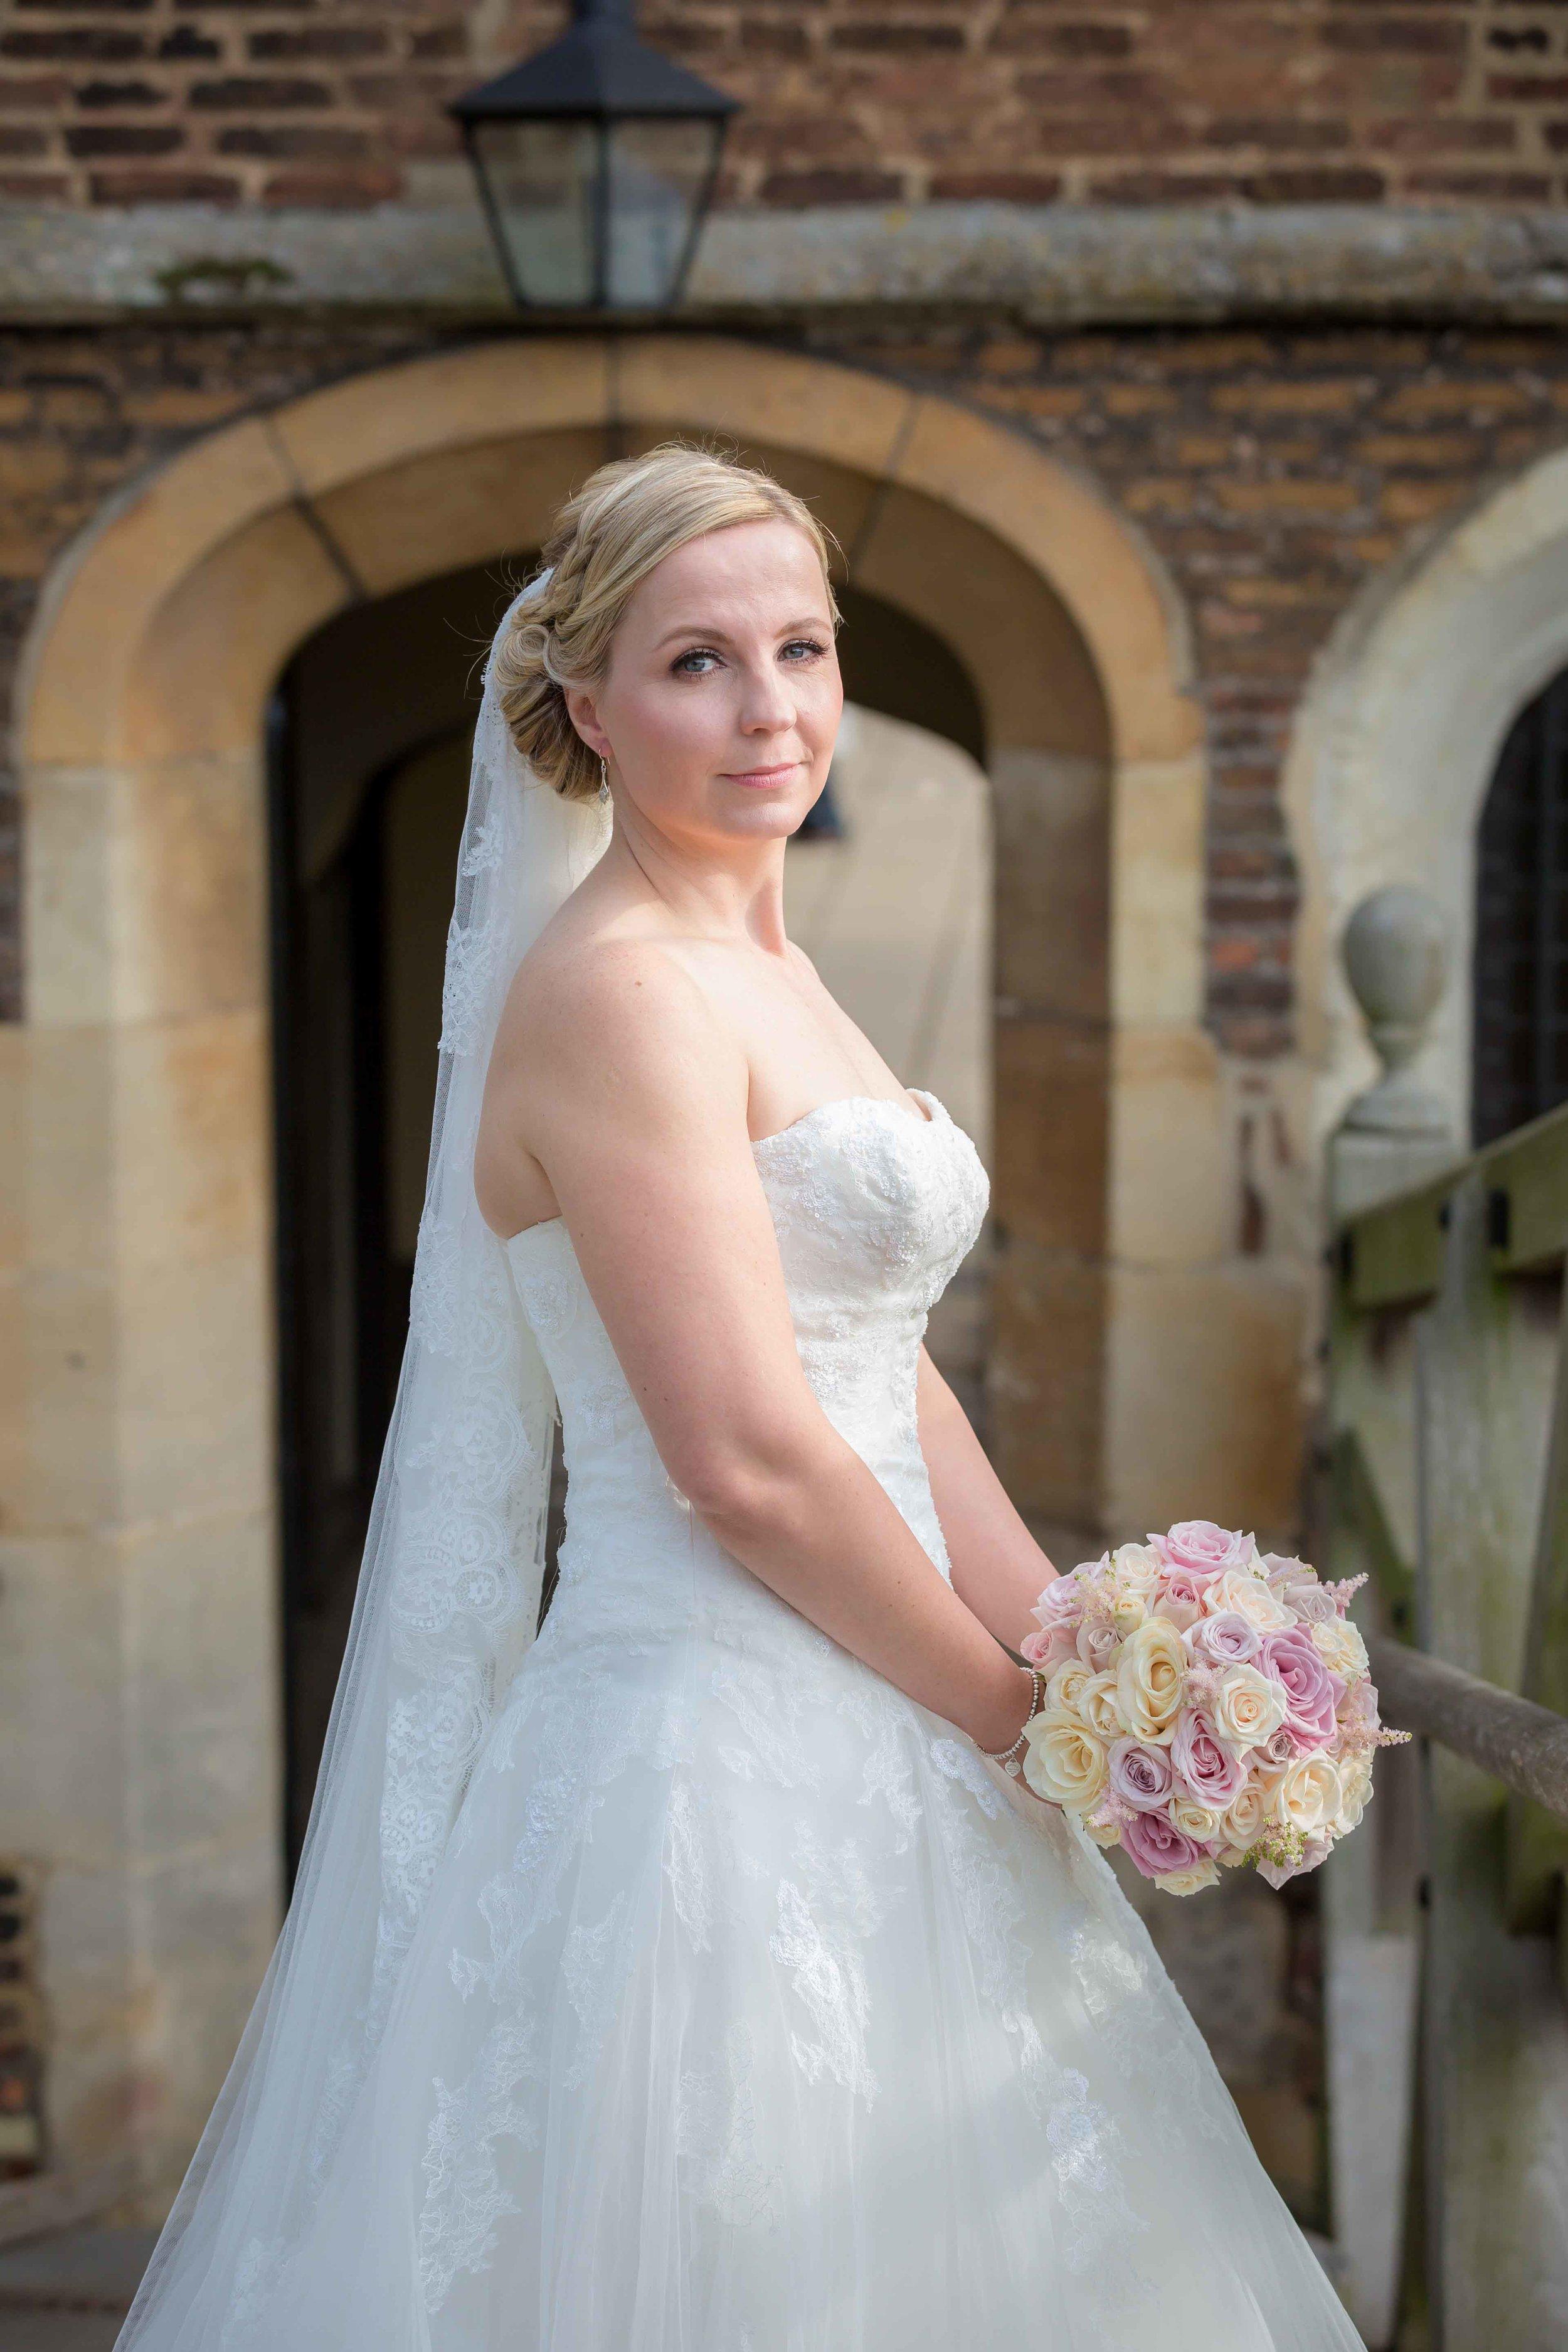 Adrian_Nicole_Charnwood_Weddings_Queens_College_Cambridge-1003.jpg